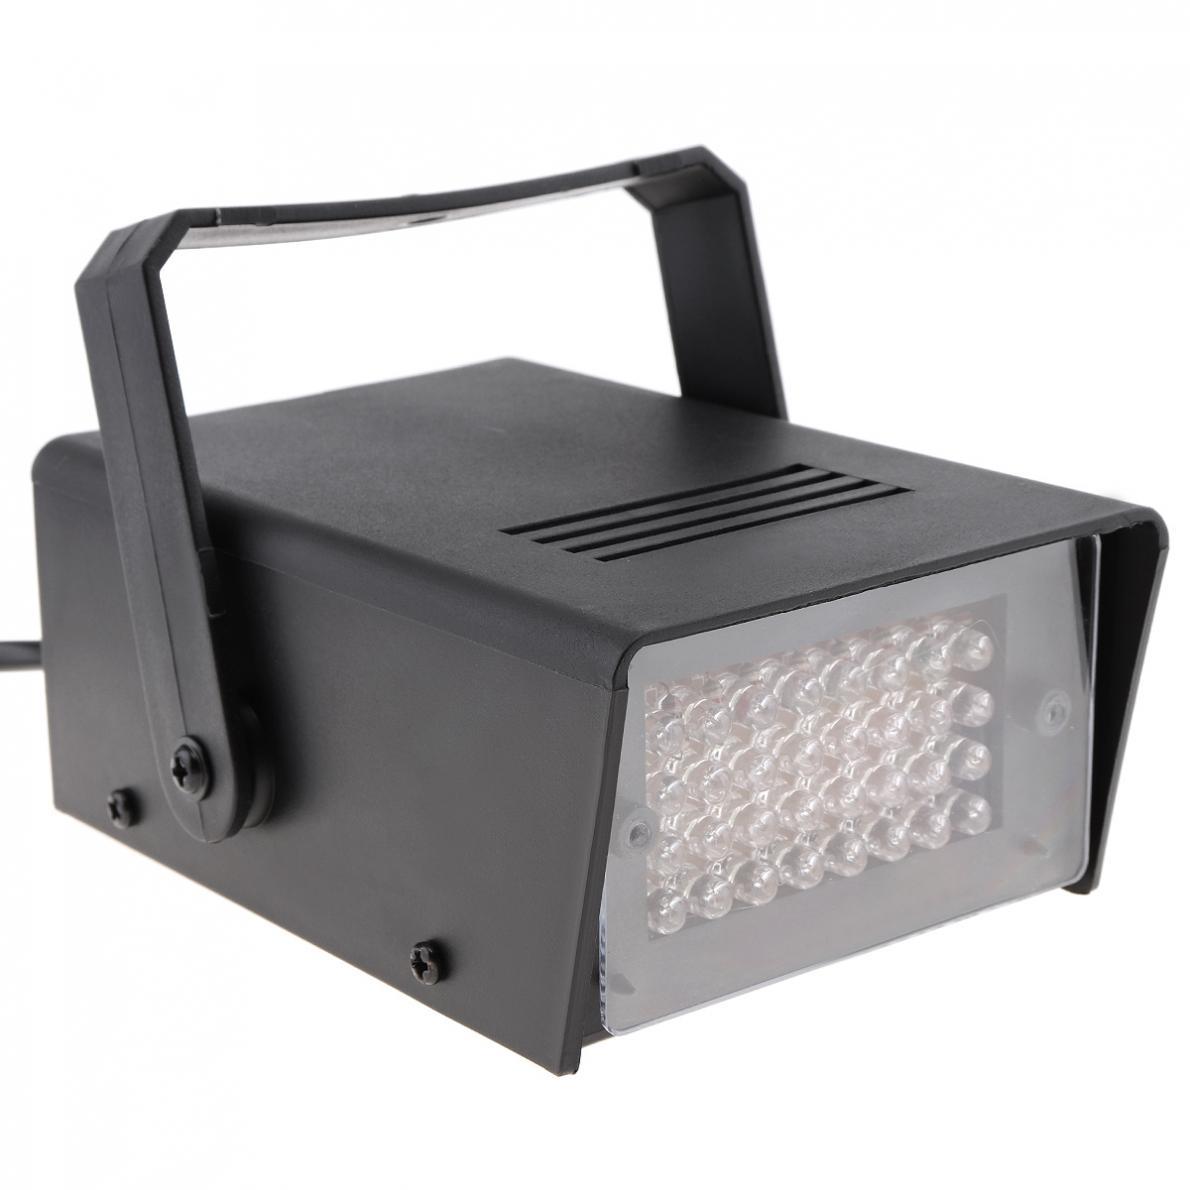 voz efeito de palco luz para pequena